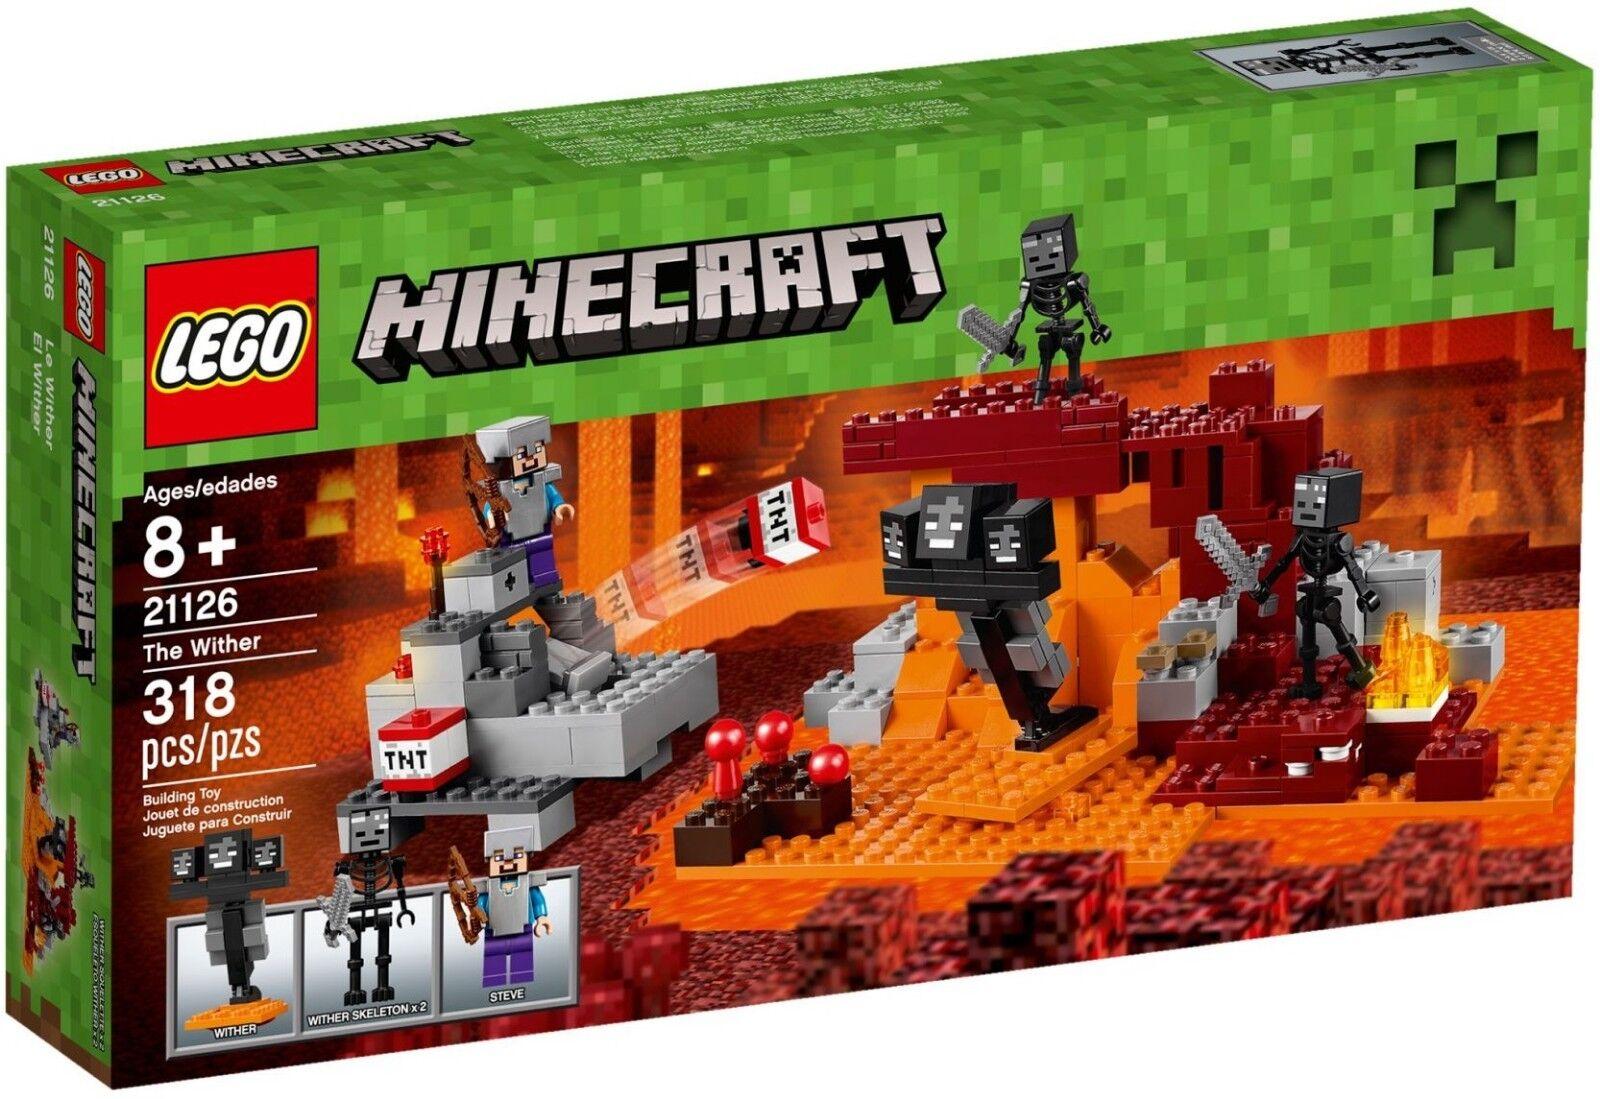 LEGO BNIB Minecraft 21126 the Wither molten Steve Skeleton minifigure